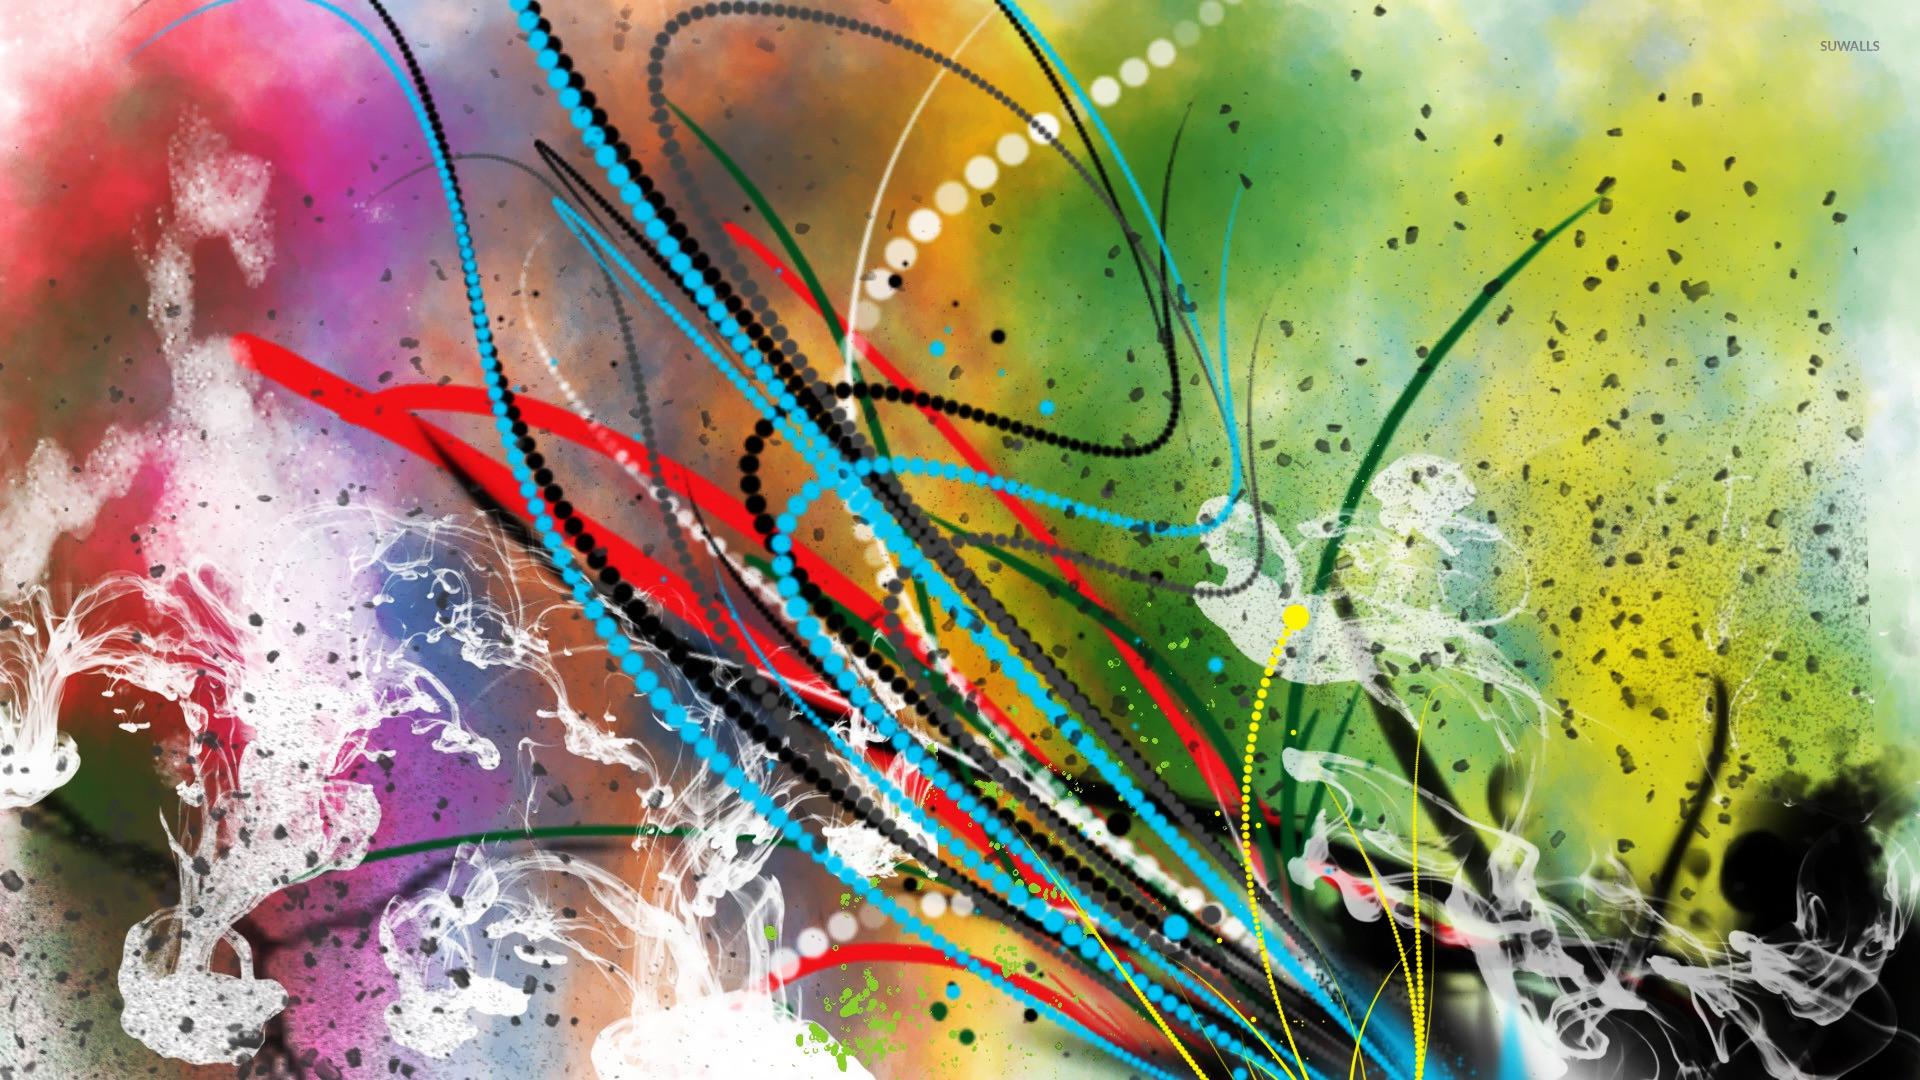 Colorful Smoke [4] wallpaper jpg